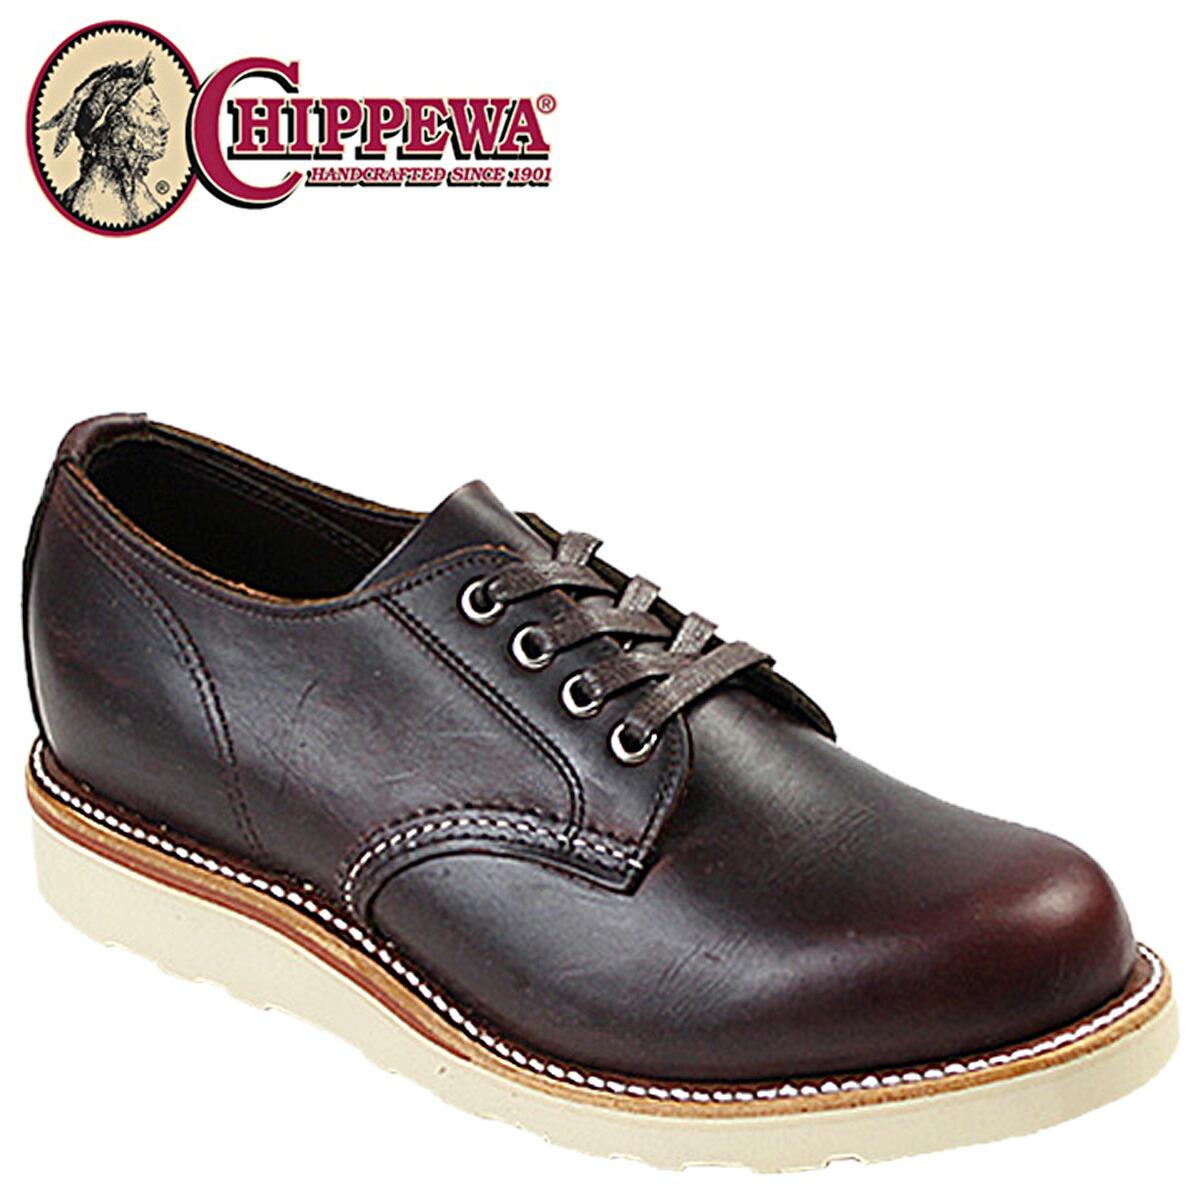 Chippewa Plain Toe Oxford Plain Toe Oxford ★